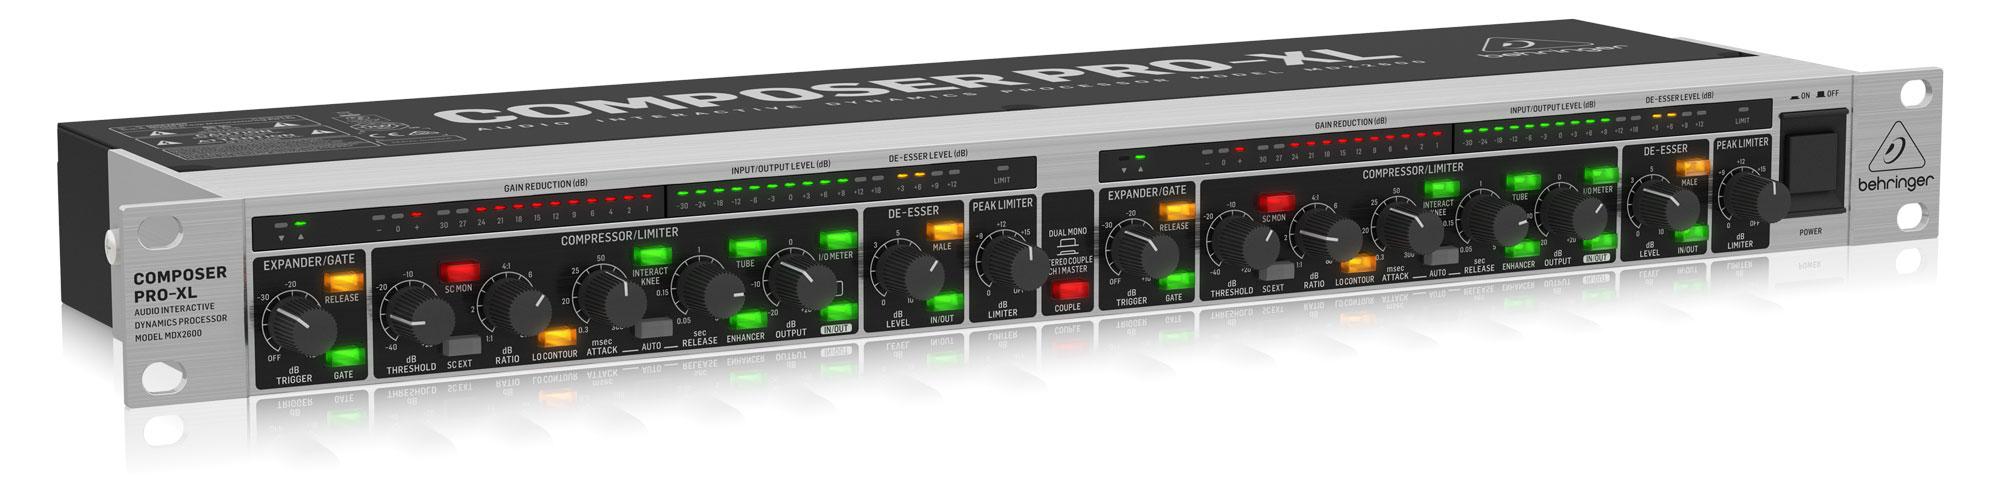 Studioeffekte - Behringer MDX2600 V2 Dynamik Prozessor - Onlineshop Musikhaus Kirstein